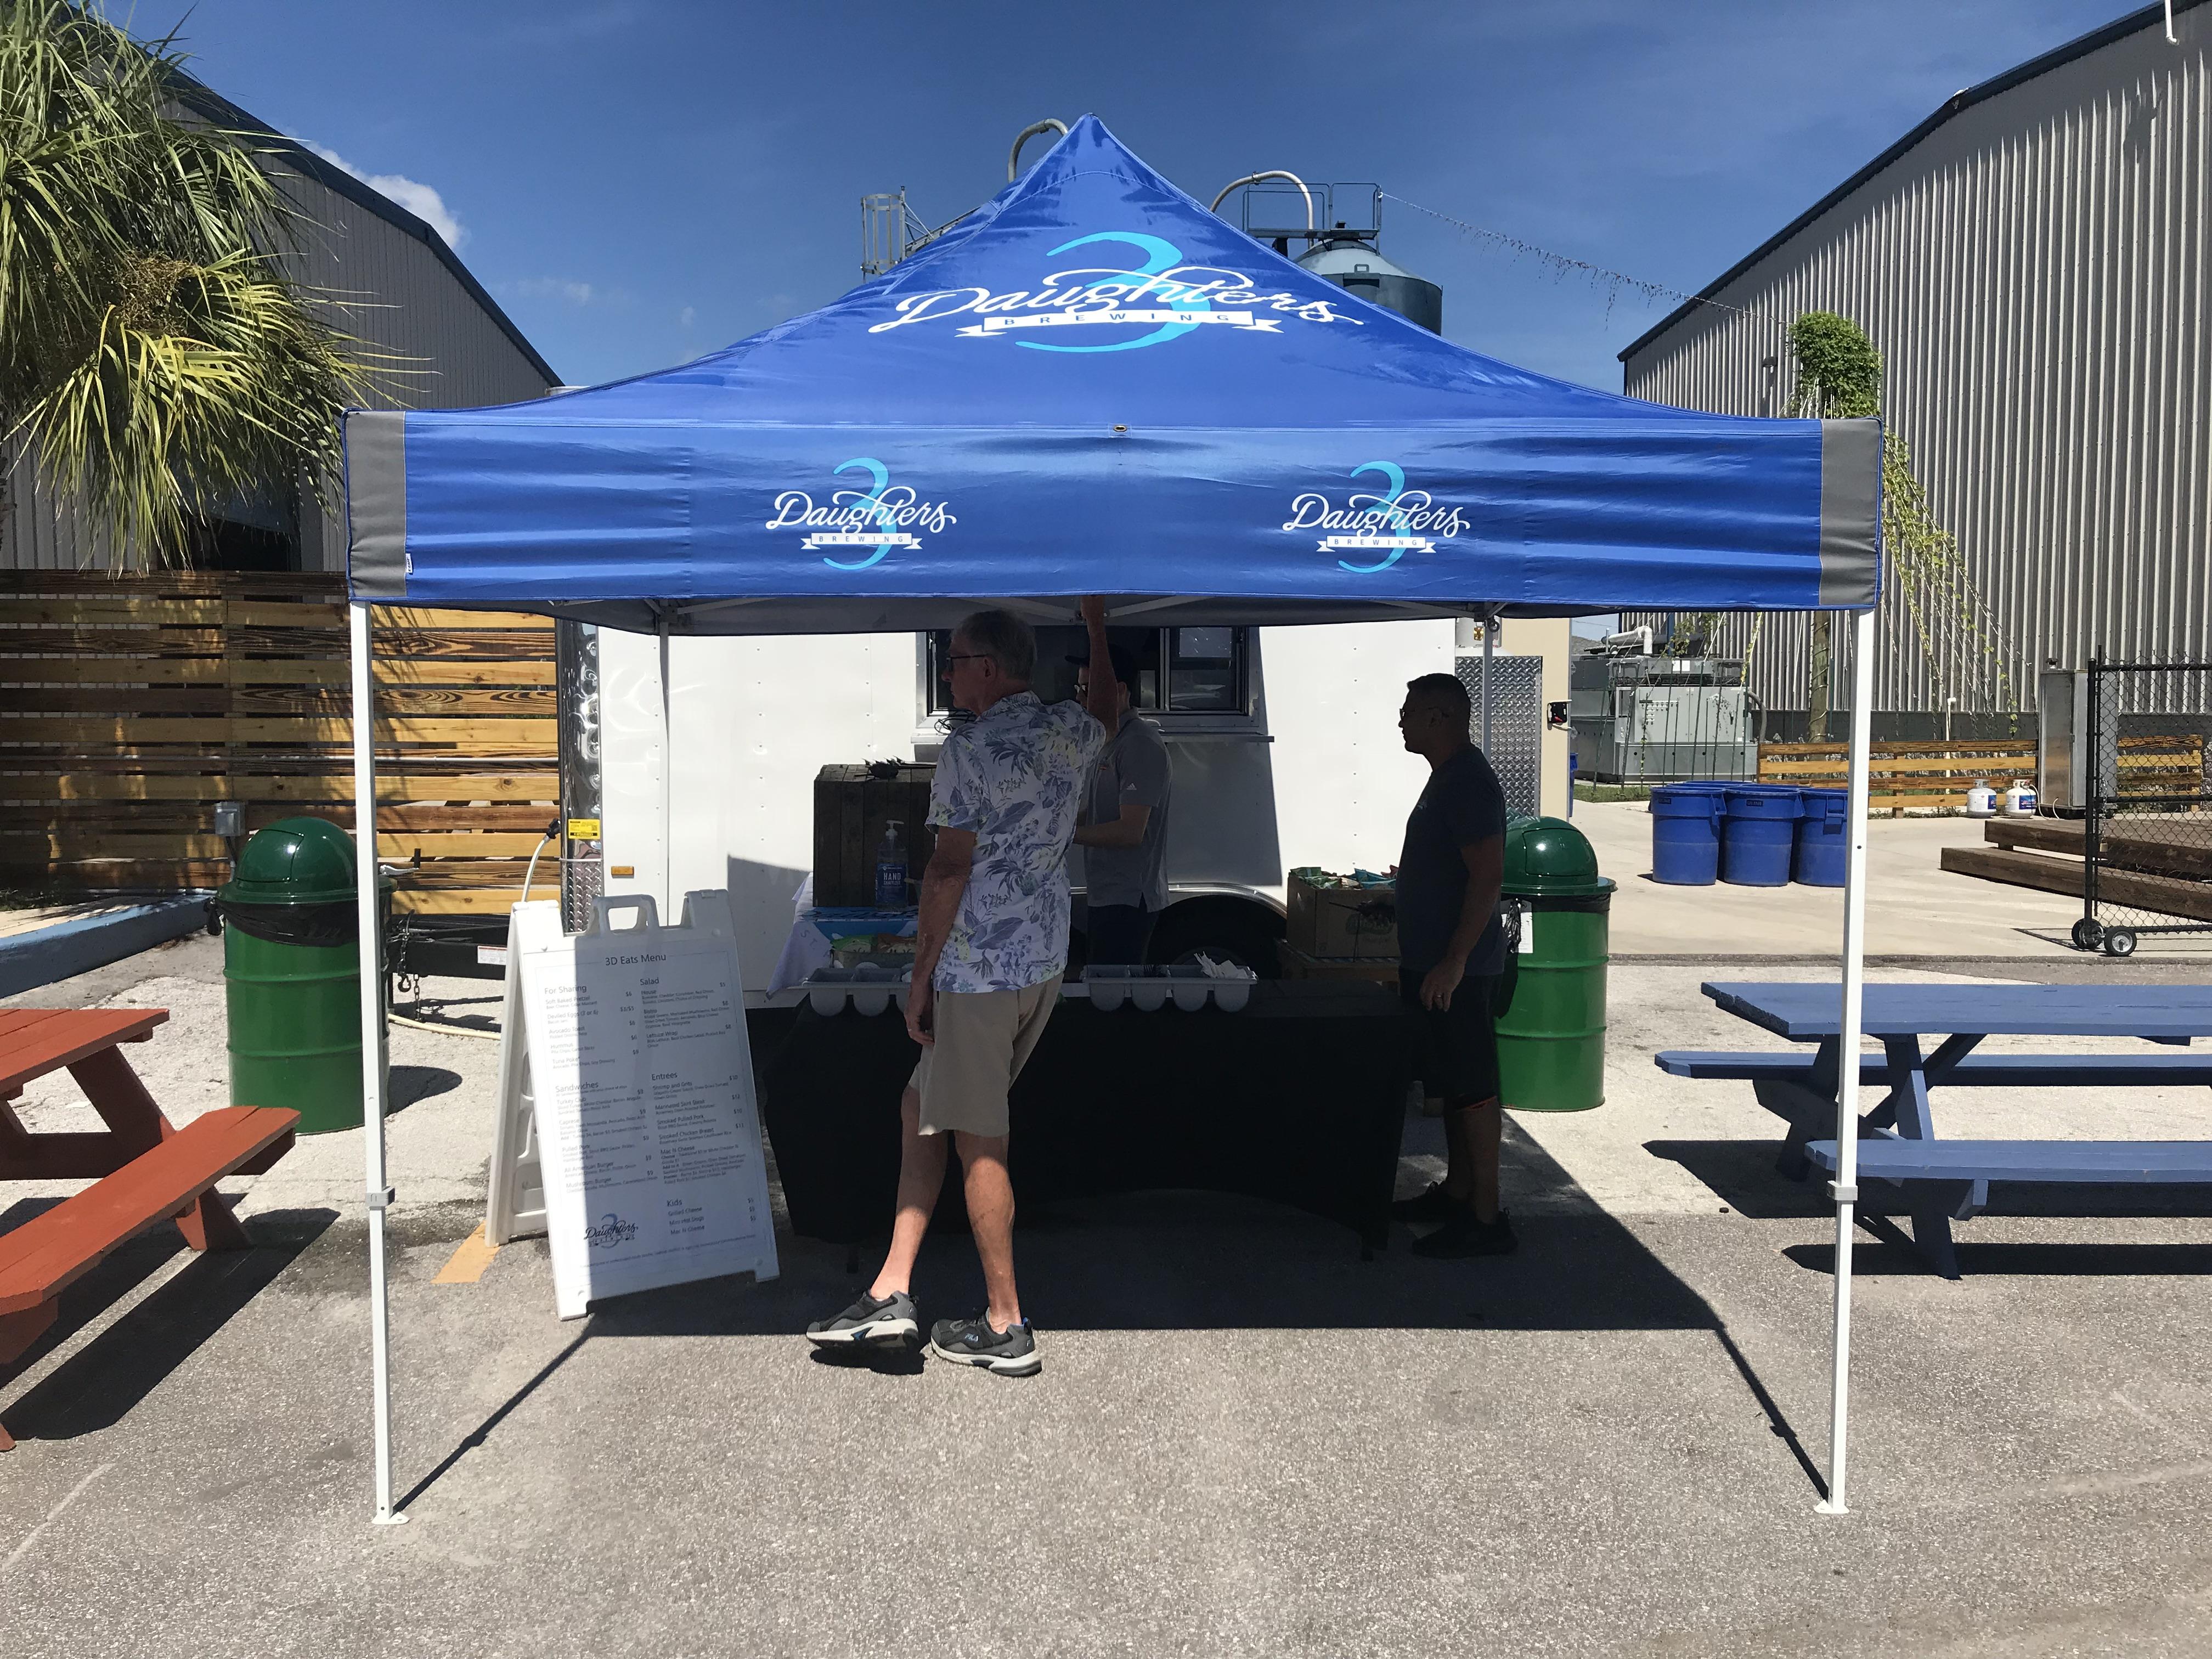 3D Food Truck outside setup